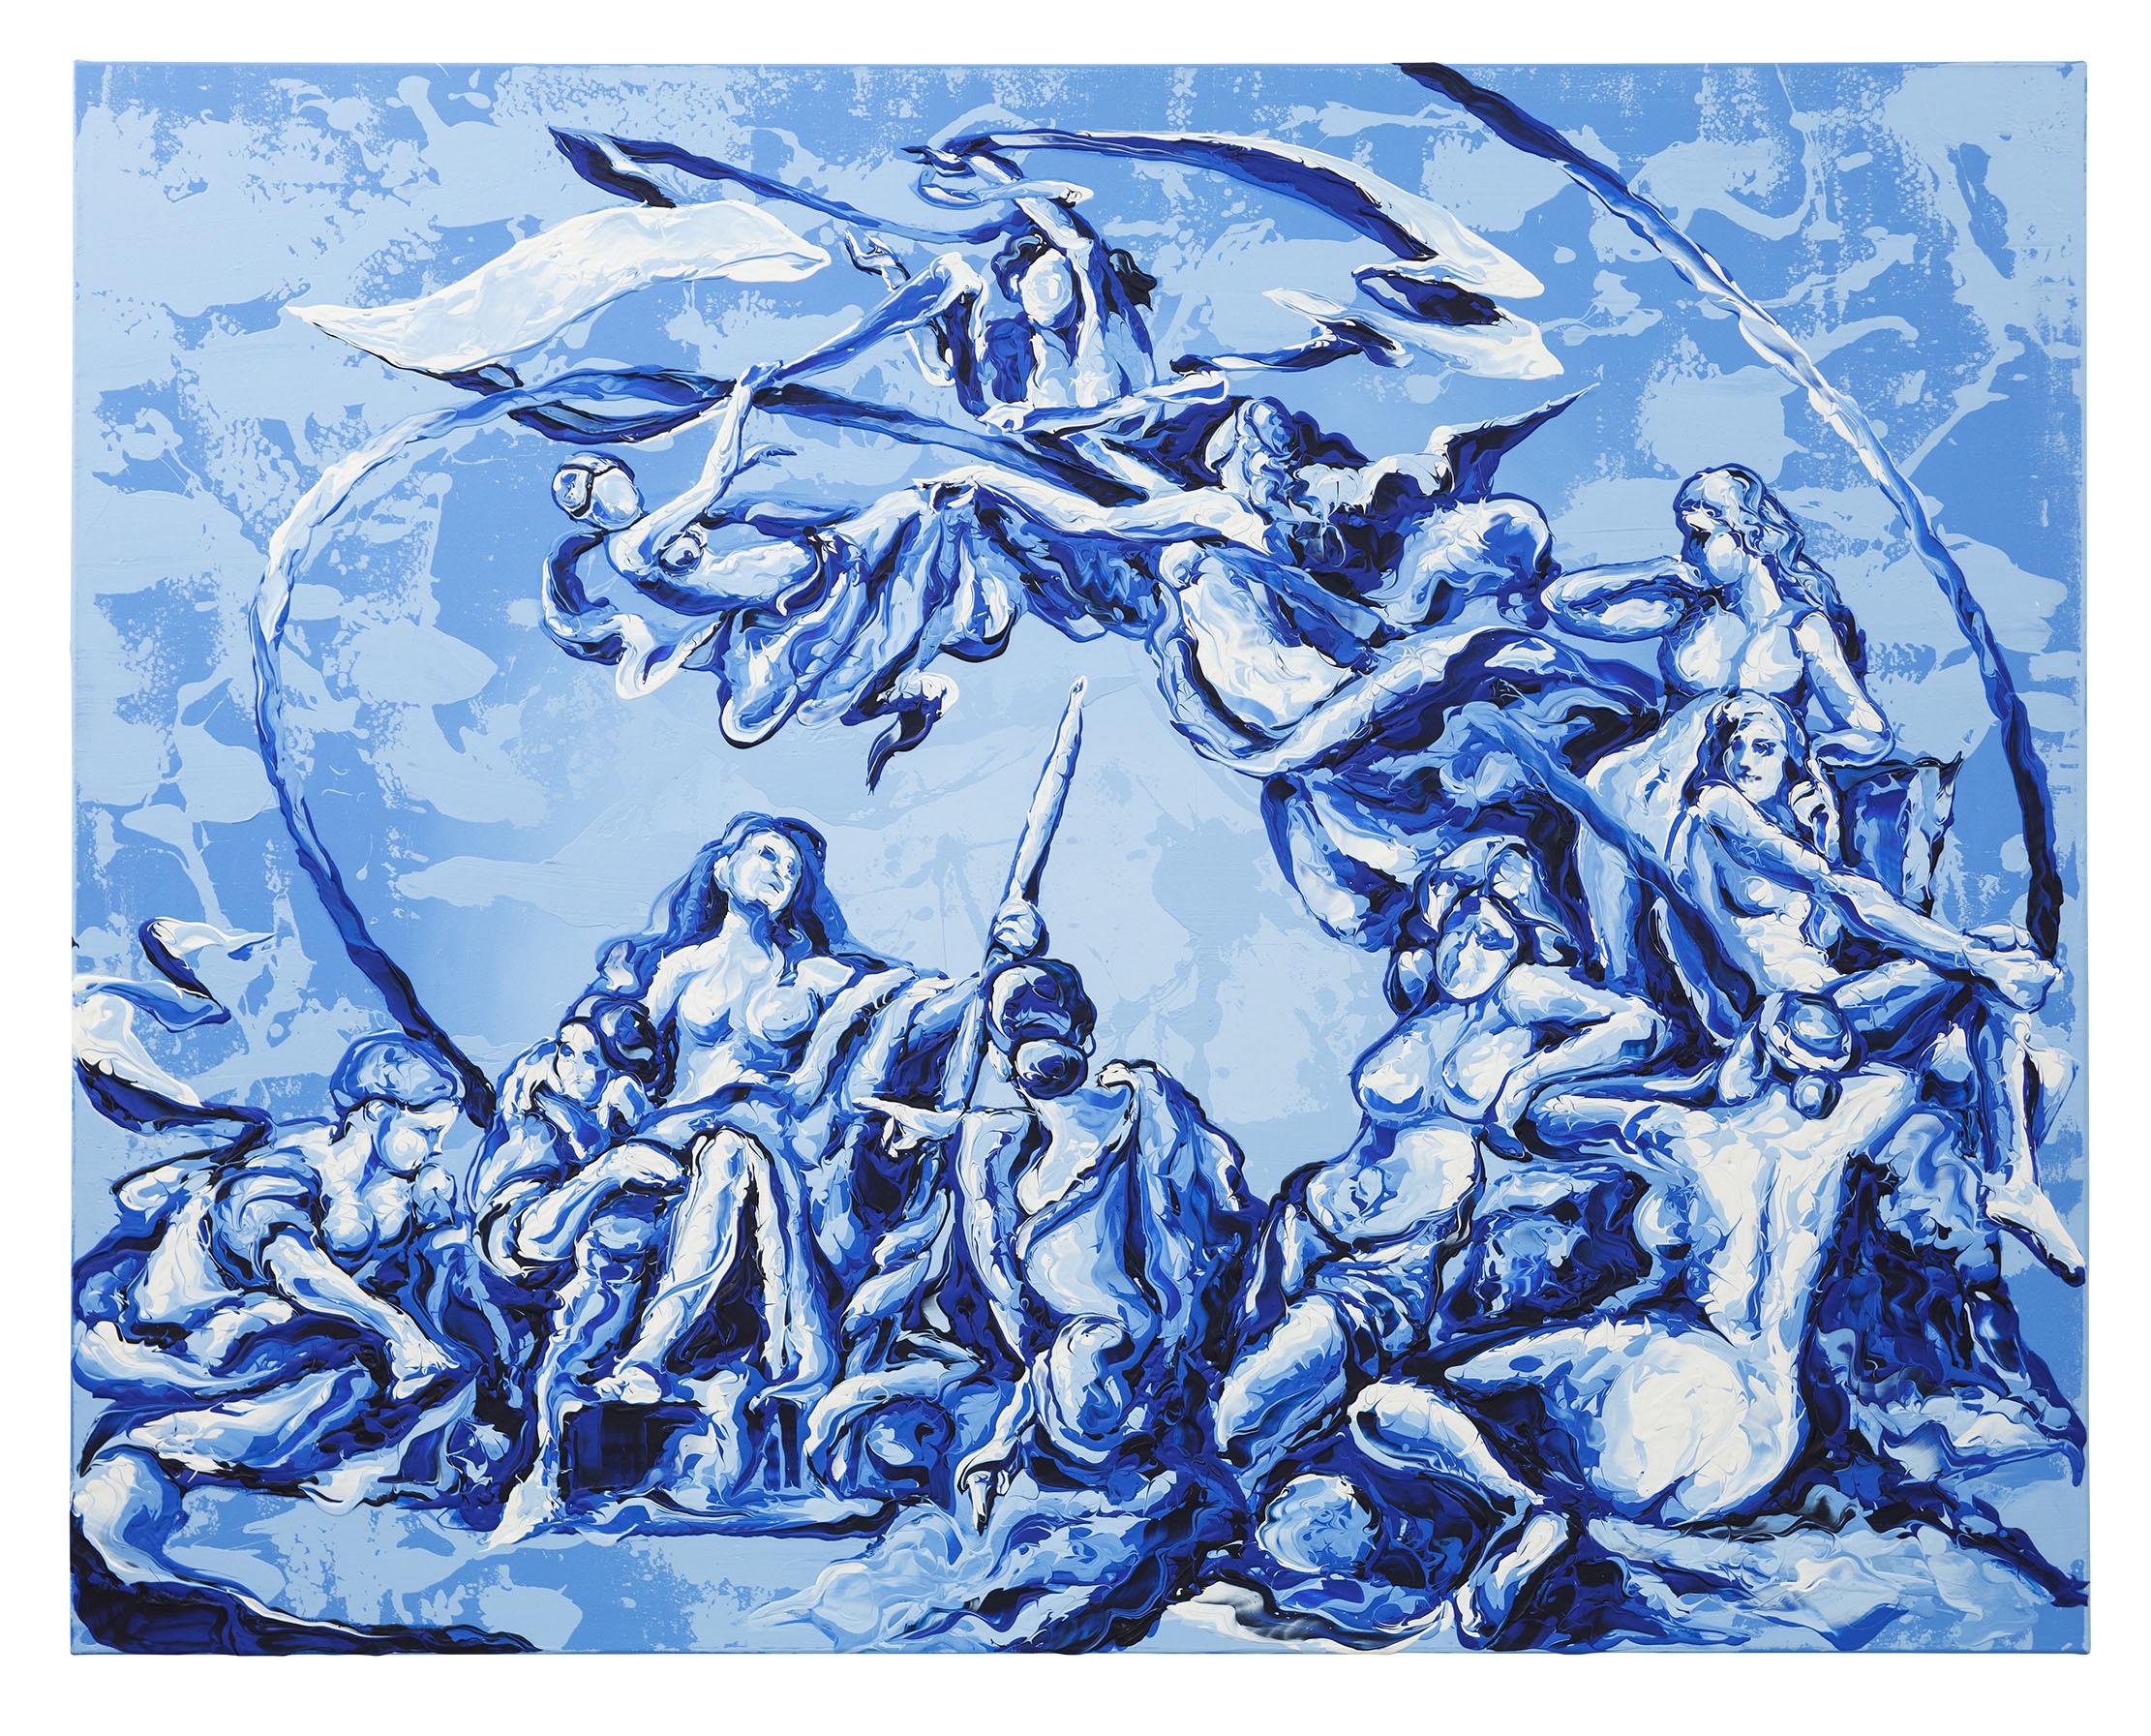 Lennart_Grau-2017_hedonistic_mythology150x190cm.jpg